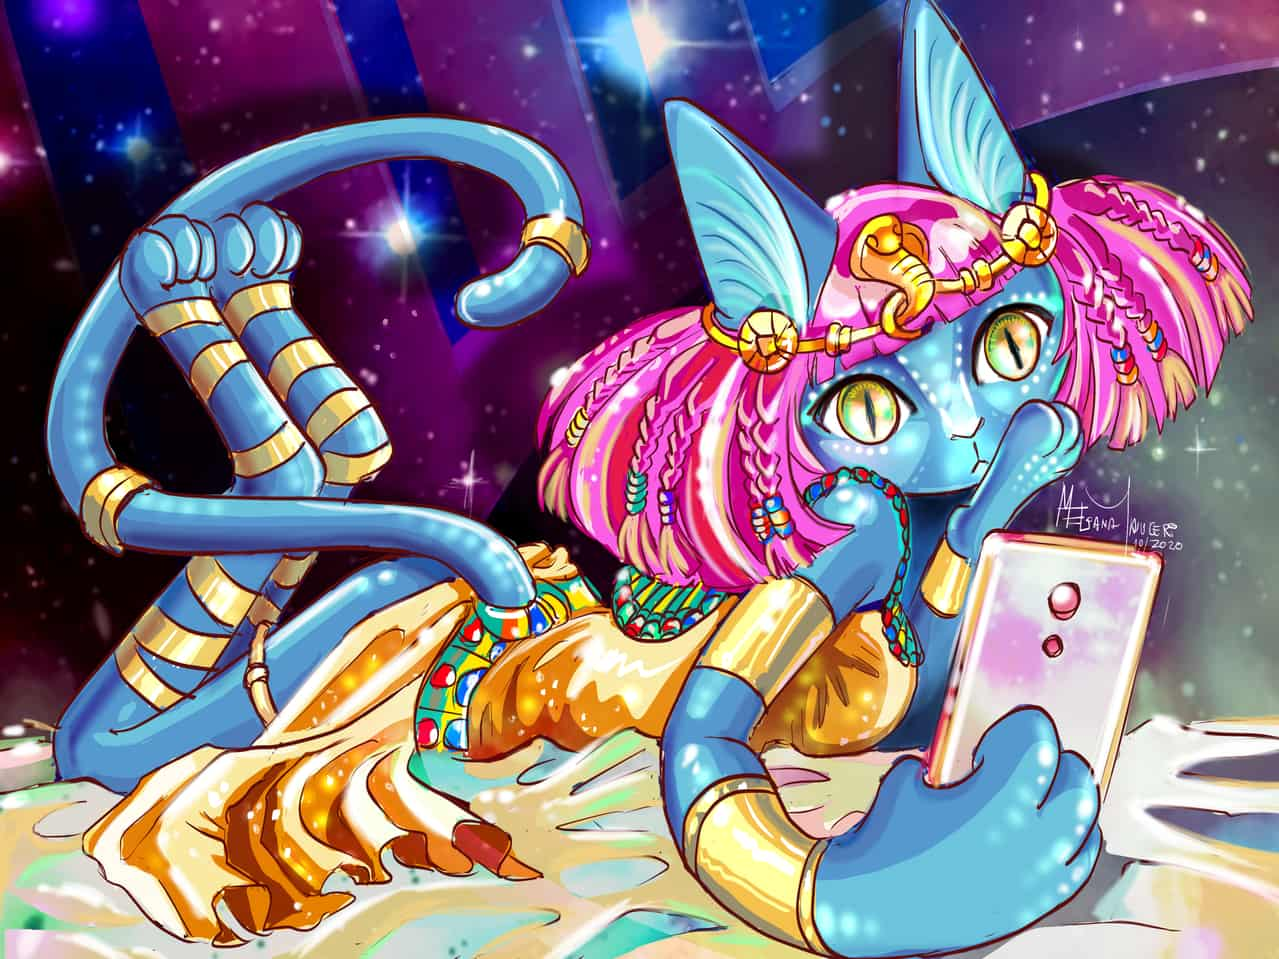 Faraona Galáctica Illust of Eliana Mauceri September2020_Contest:Furry color original Faraon originalart furry oc gatos galaxy